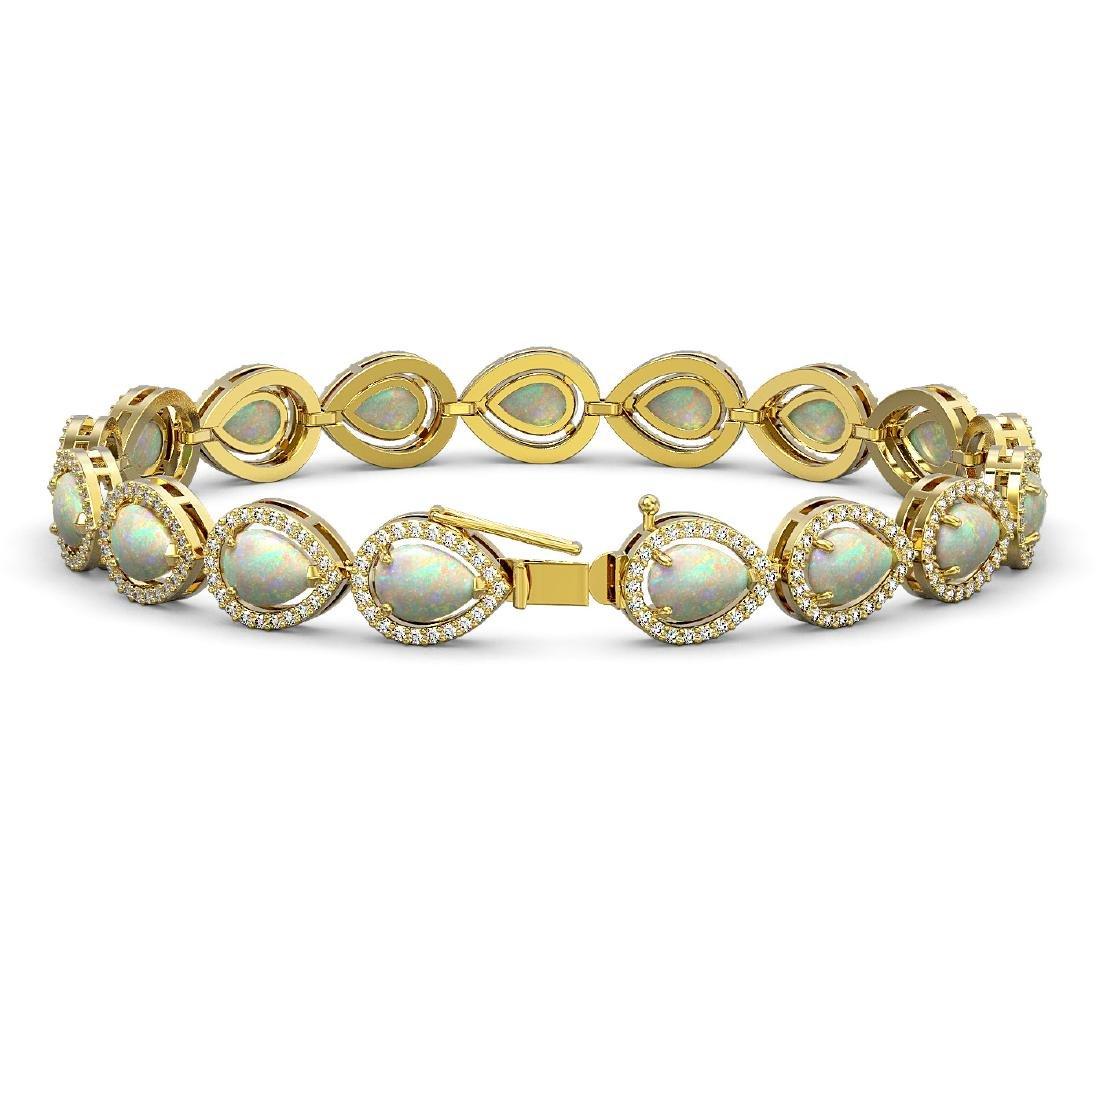 13.19 CTW Opal & Diamond Halo Bracelet 10K Yellow Gold - 2